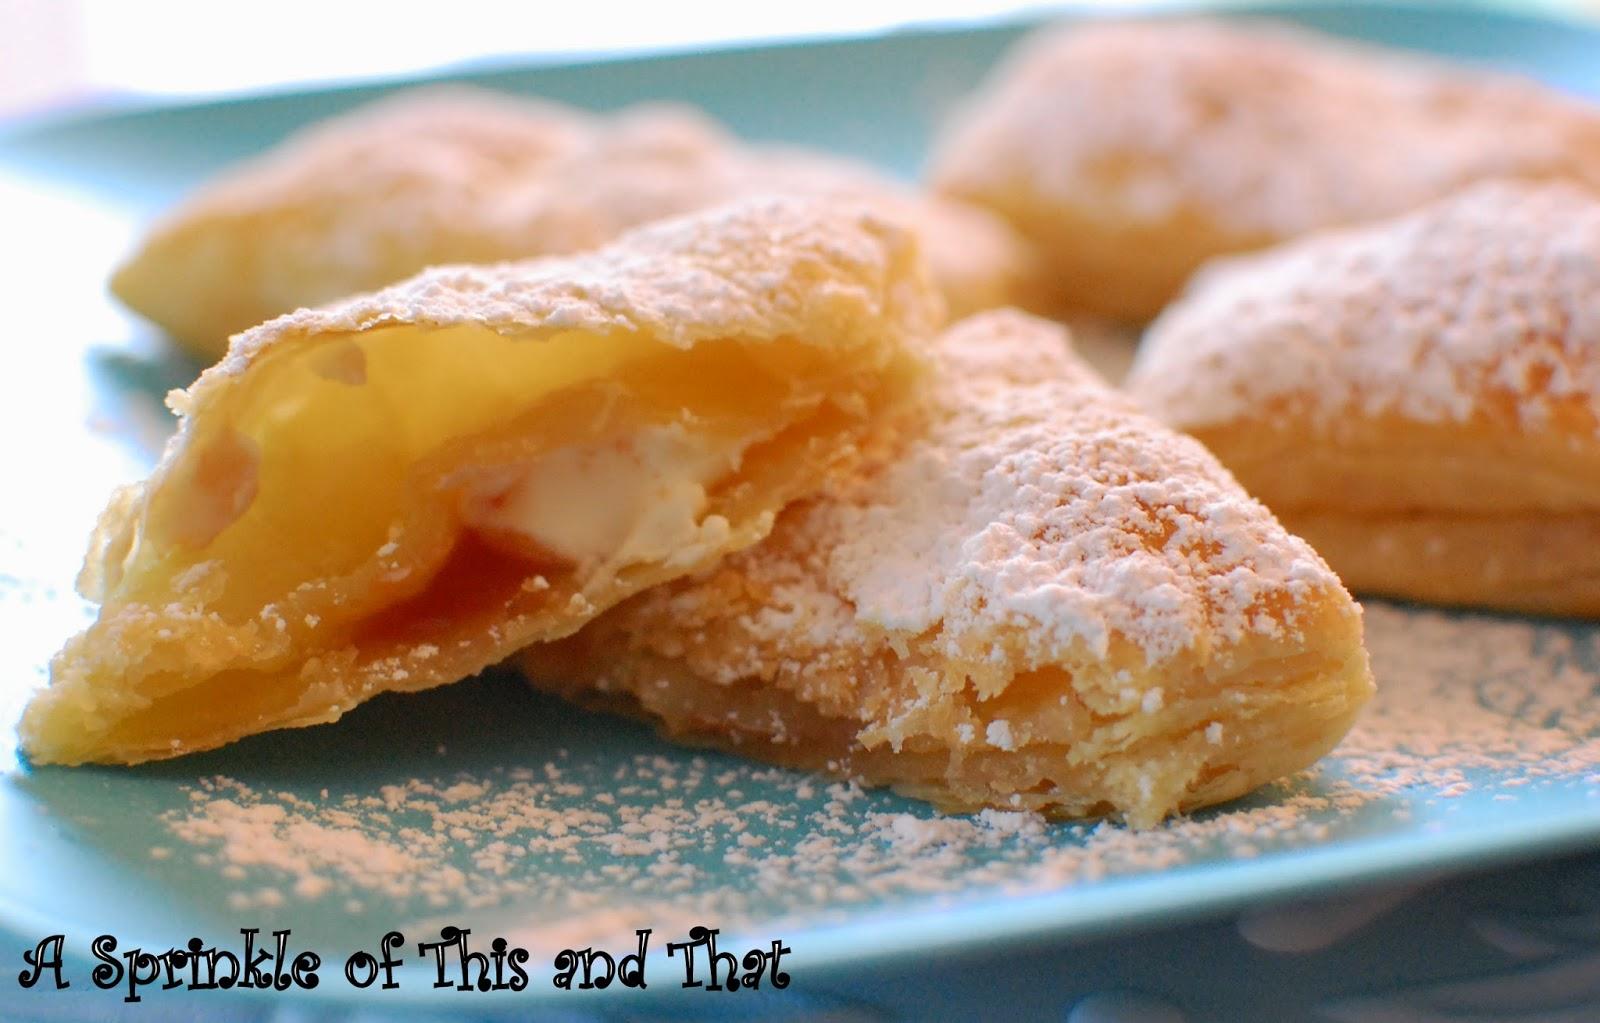 pastry cream guava and cream cheese pastry ang sarap guava cream ...